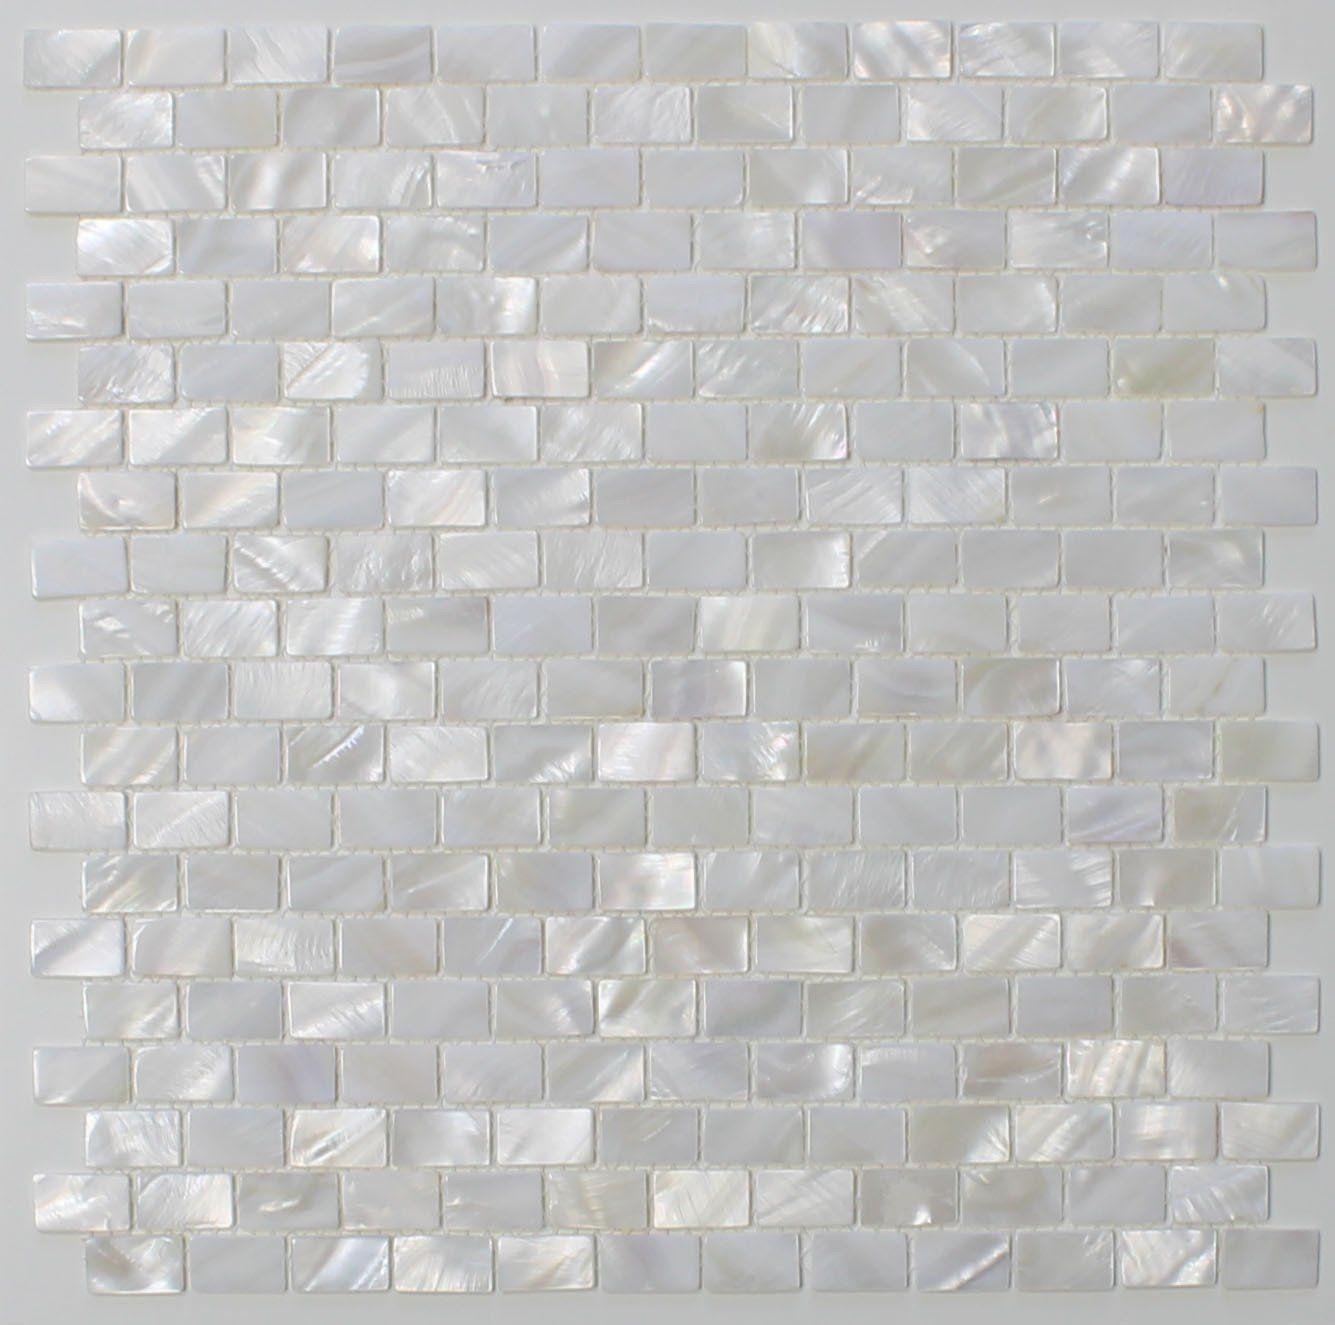 Penny Round Tile Arctic White Porcelain Mosaic Matte Look Marble